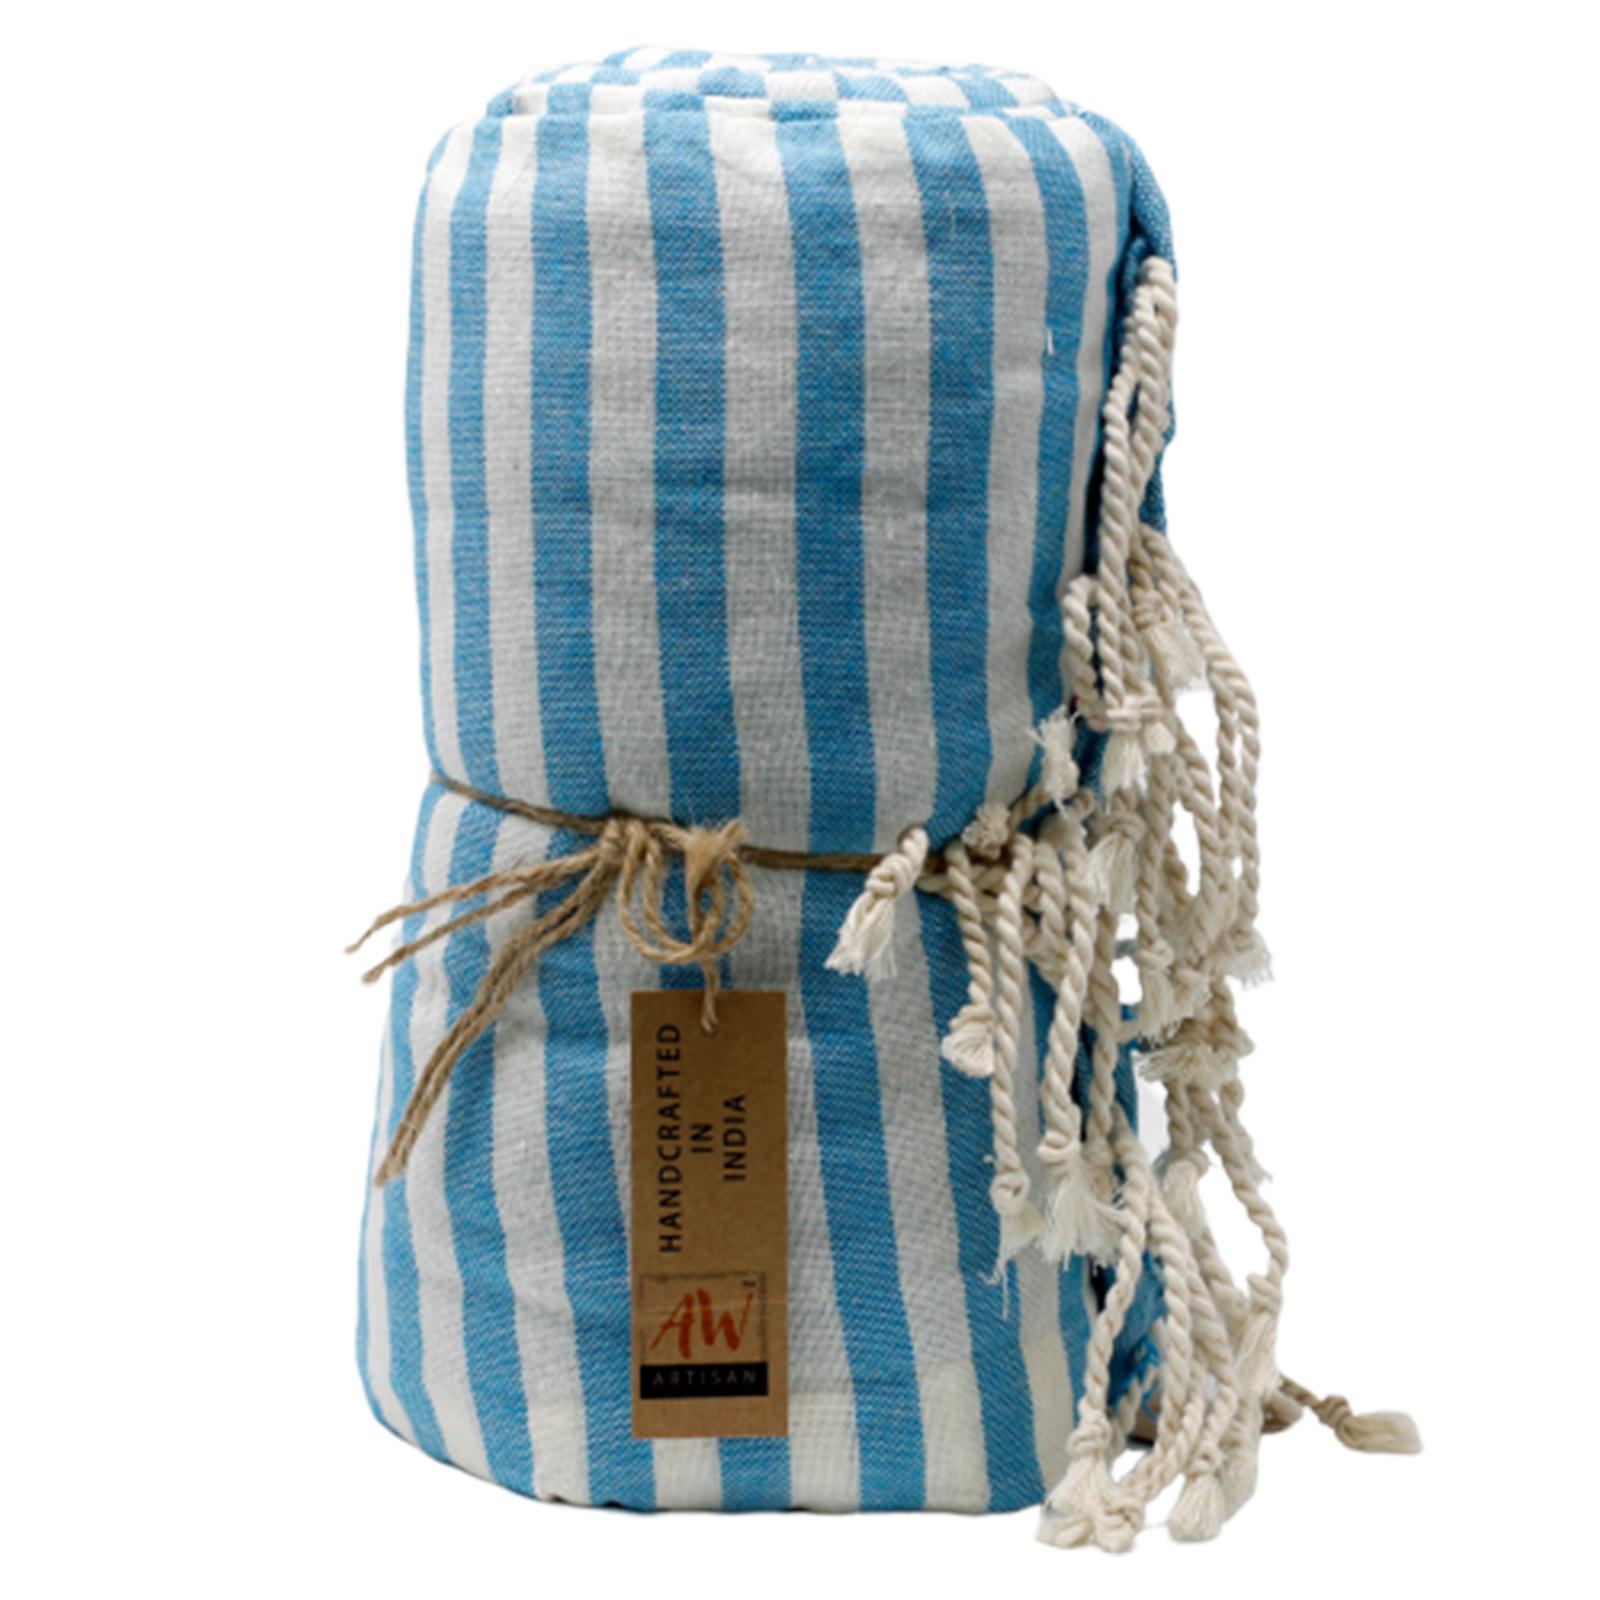 Cotton Pario Towel 100x180 cm Sky Blue